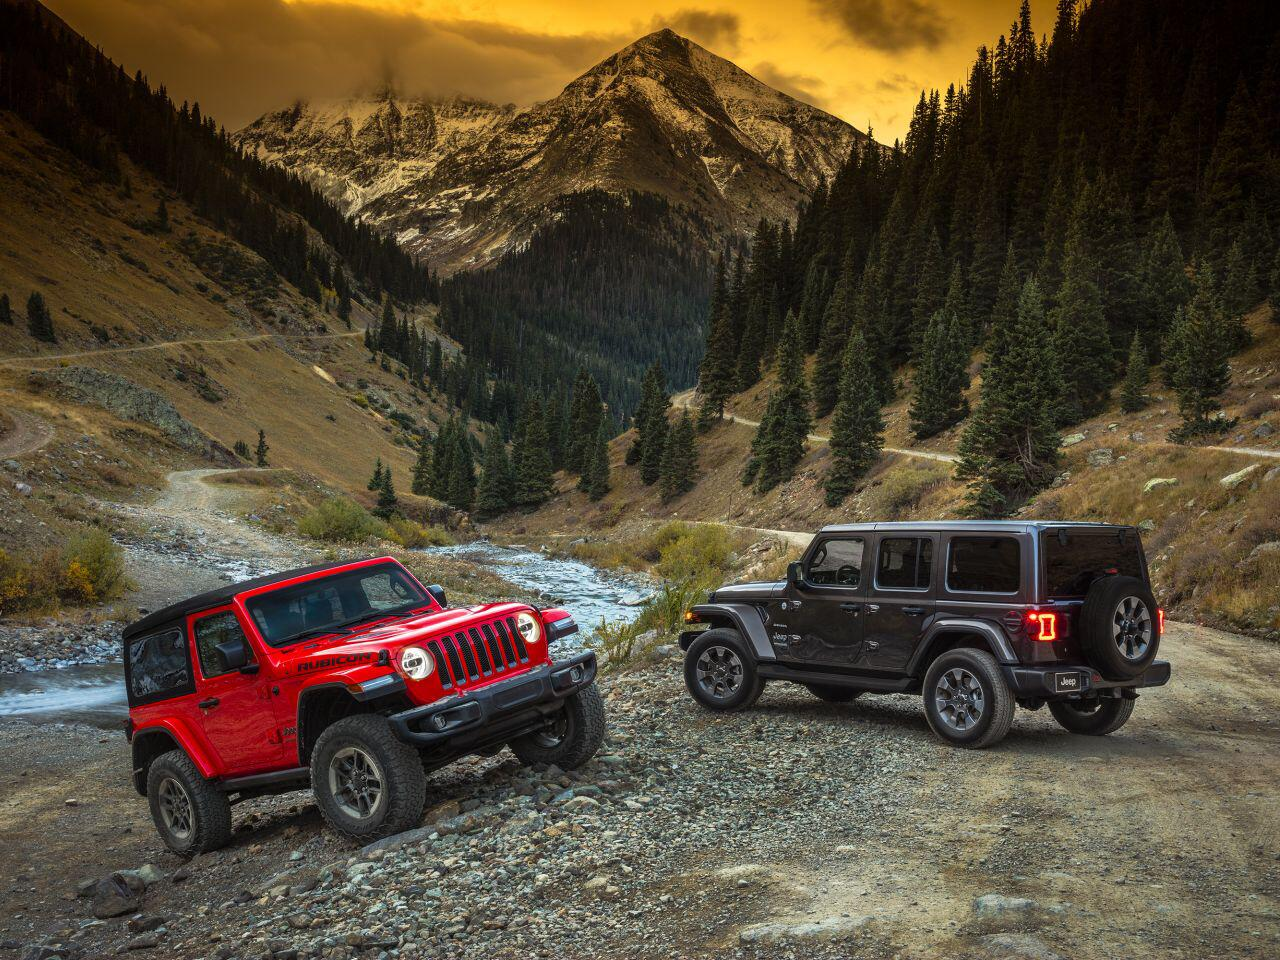 Bild zu Jeep Wrangler Rubicon und Jeep Wrangler Sahara